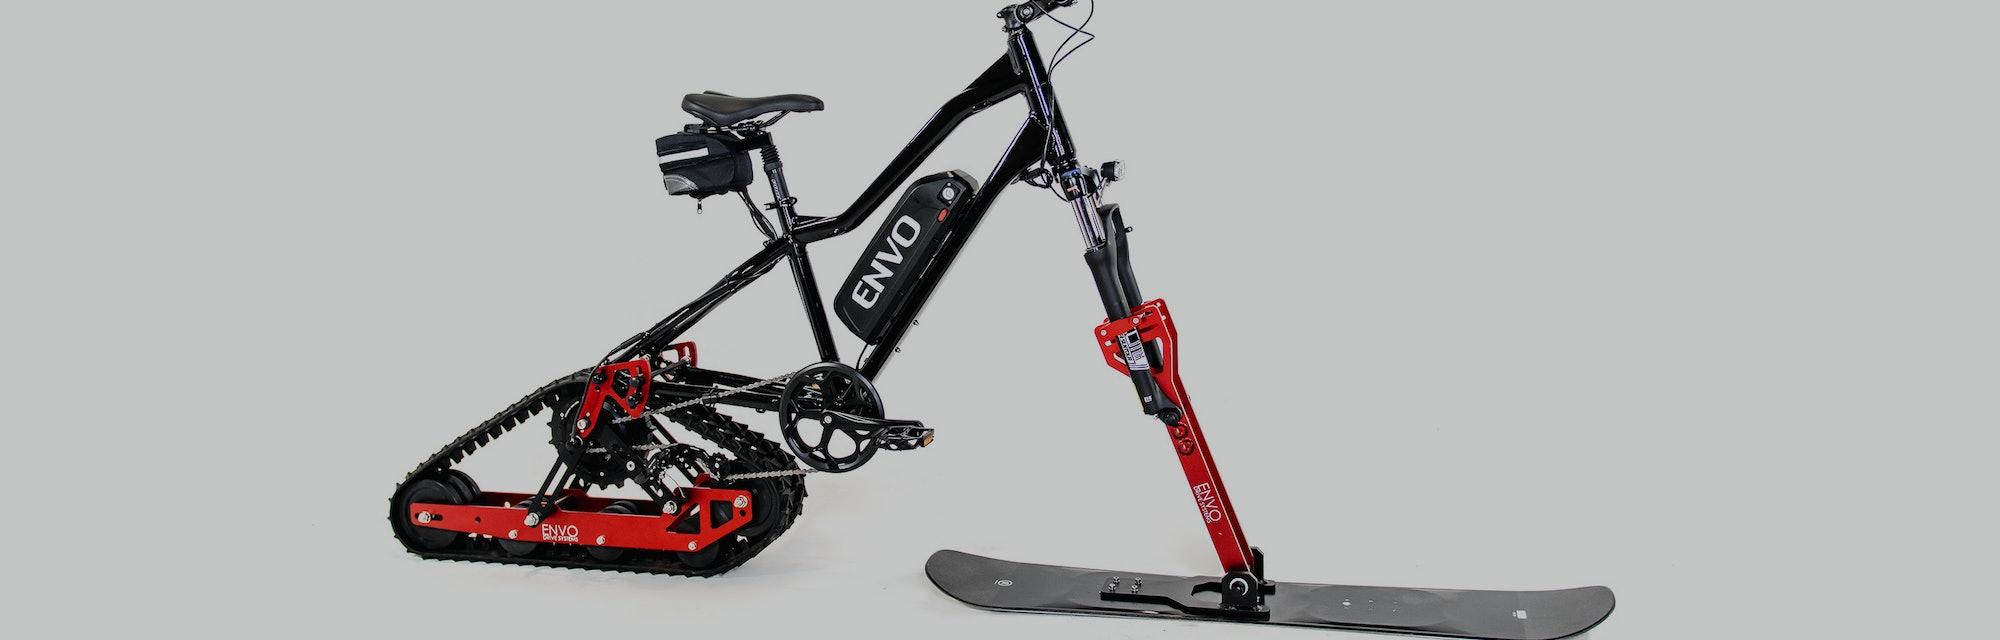 Envo's conversion kit turns a regular mountain bike into an electric snowbike.